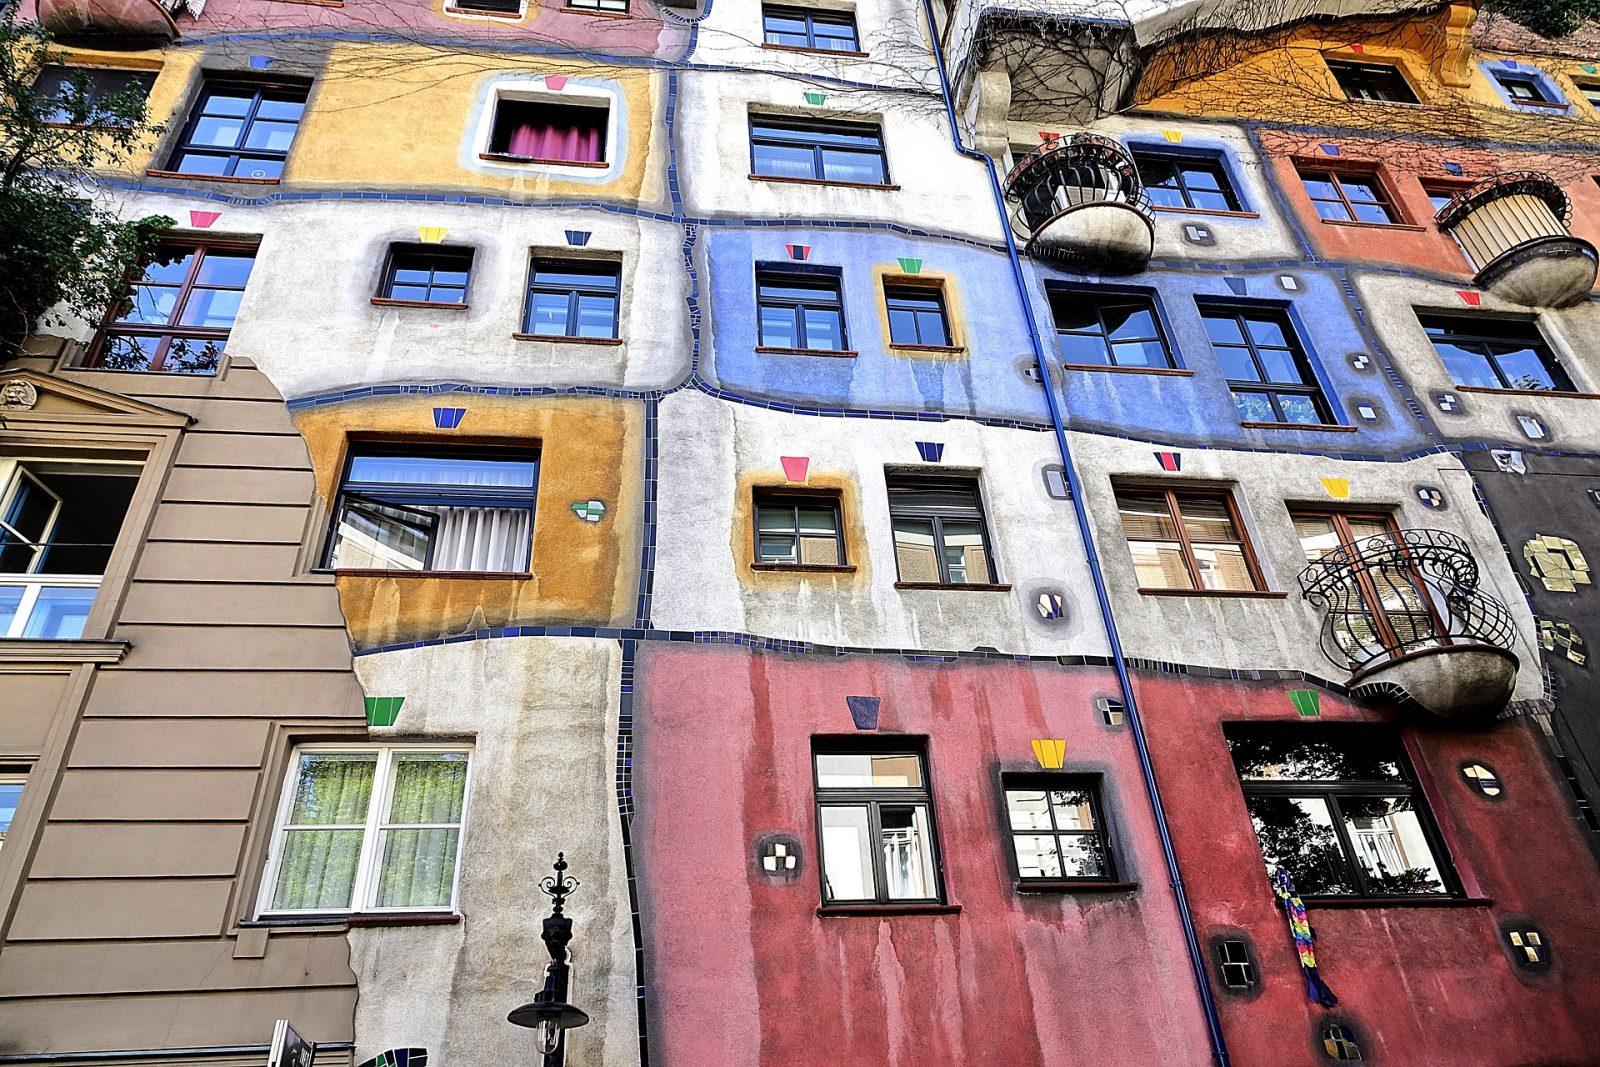 Evropski gradovi, Evropska putovanja, Evropske metropole, Beč